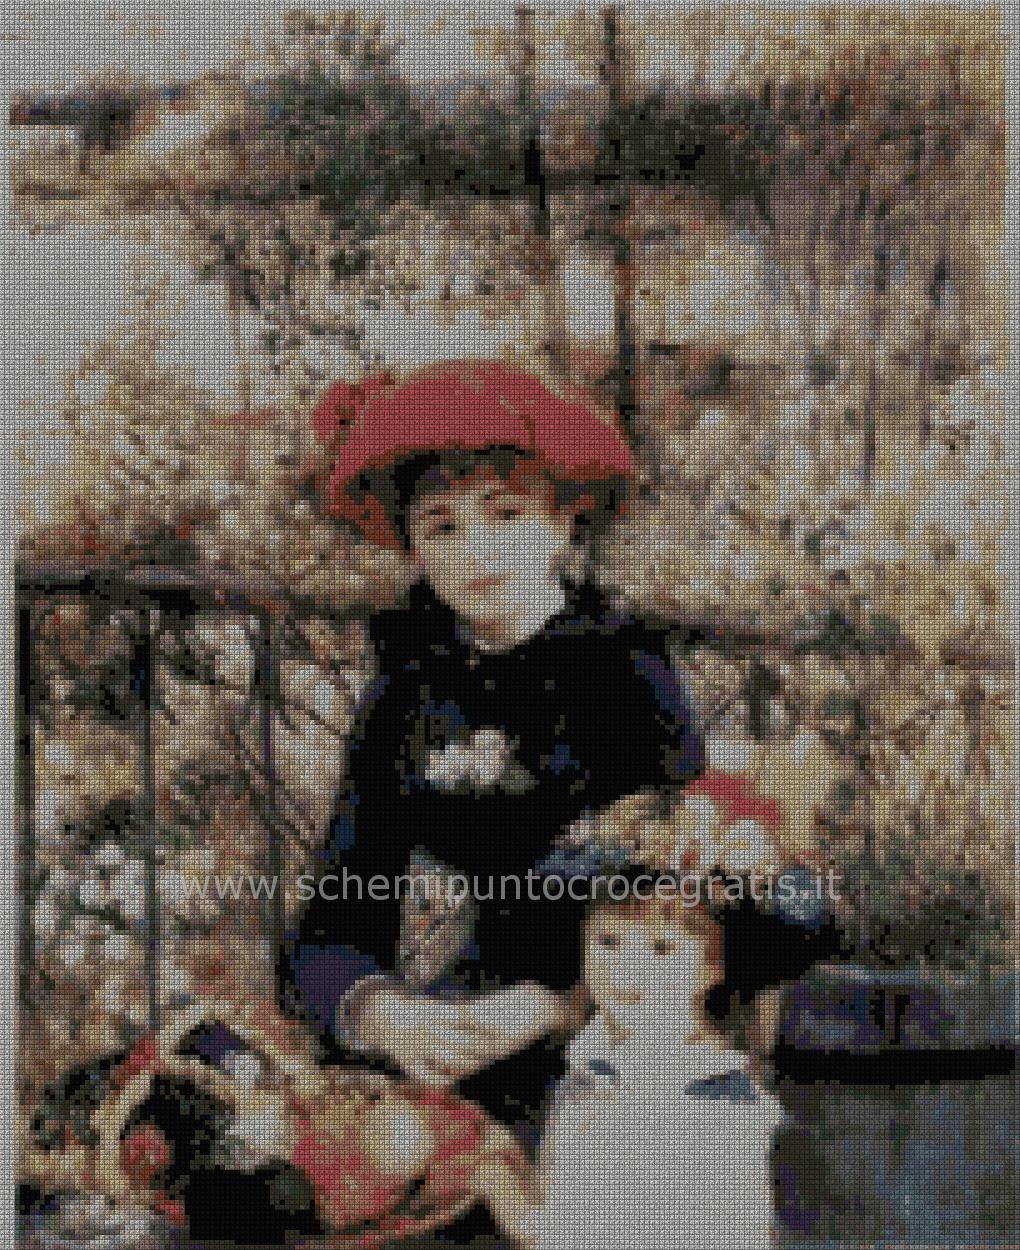 pittori_moderni/renoir/Renoir07.jpg